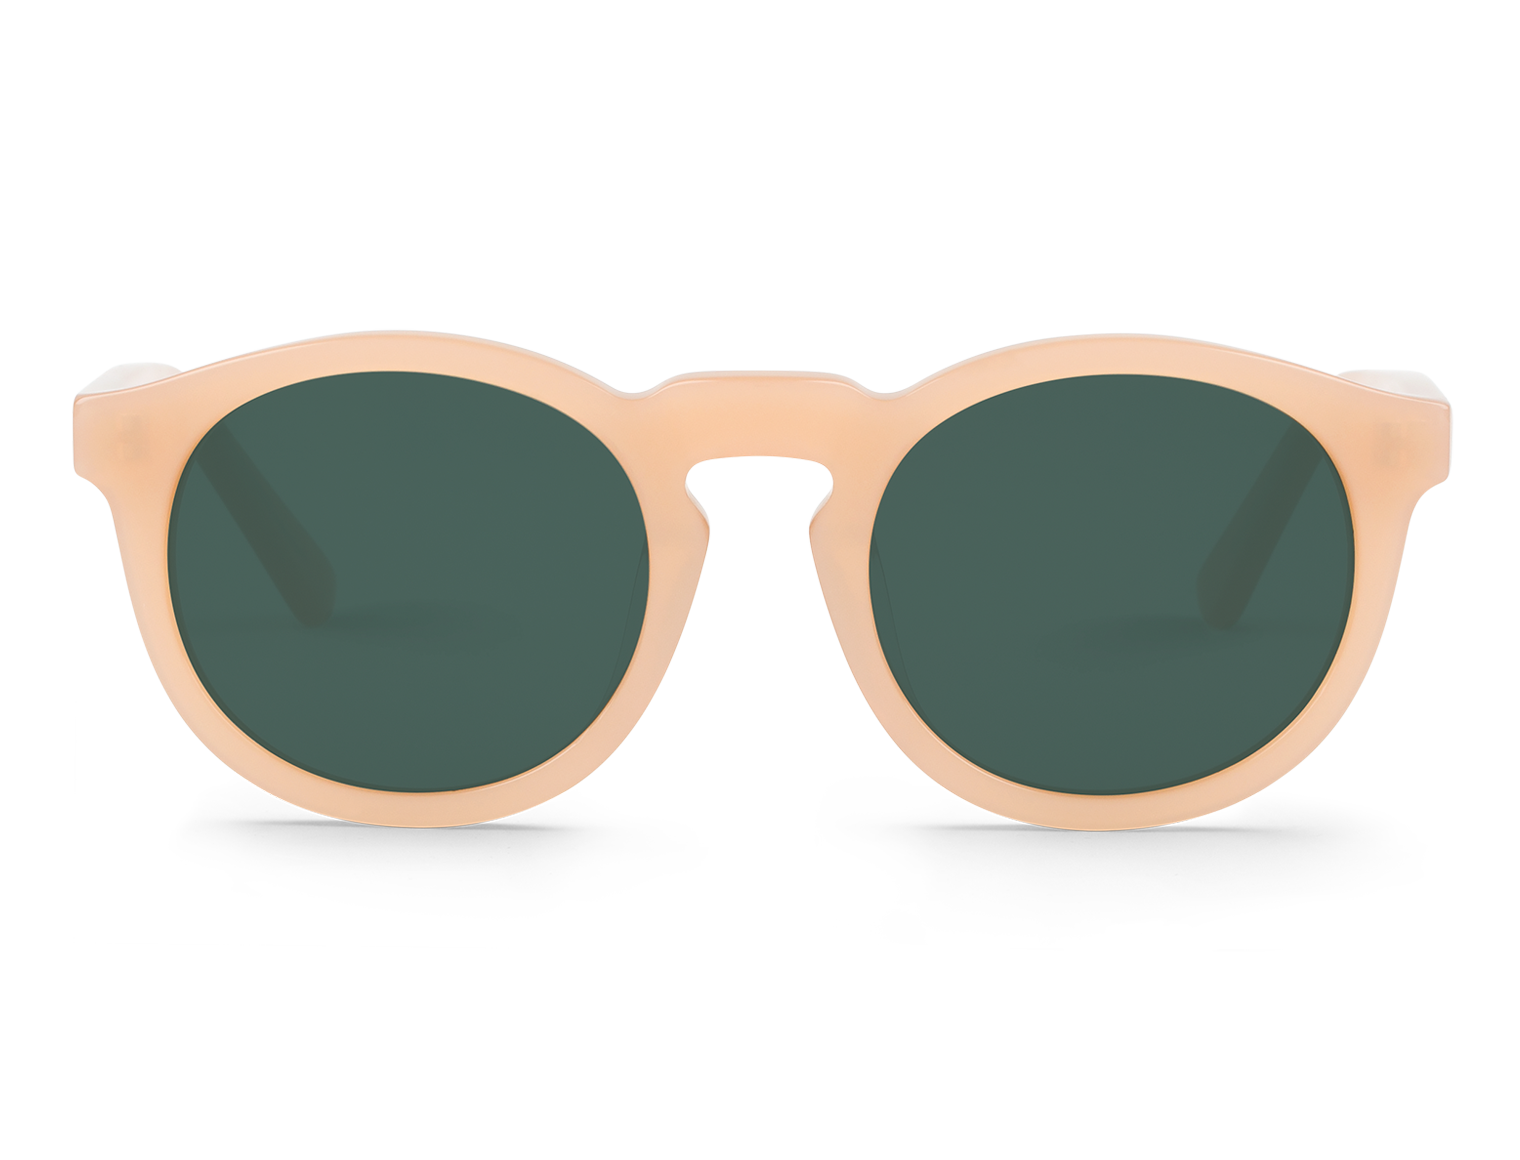 JORDAAN | POWDER with classical lenses